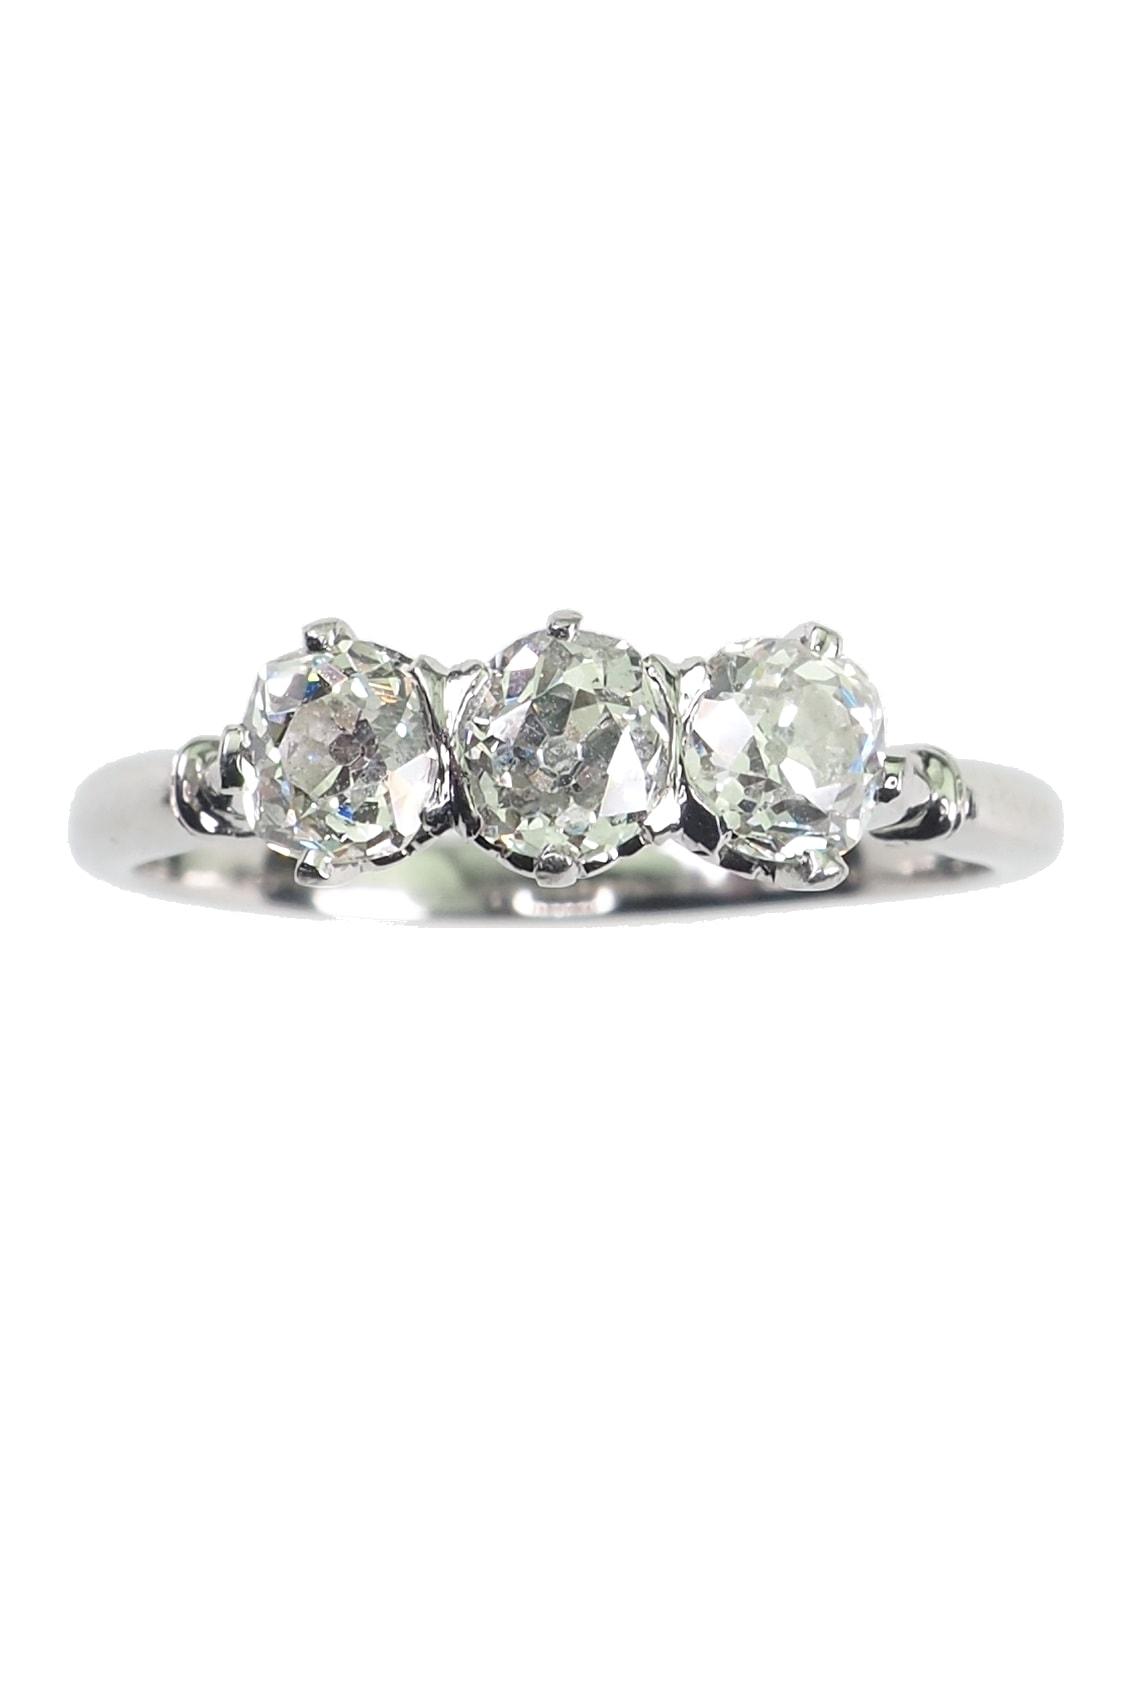 Diamantschmuck-zertifiziert-kaufen-1008